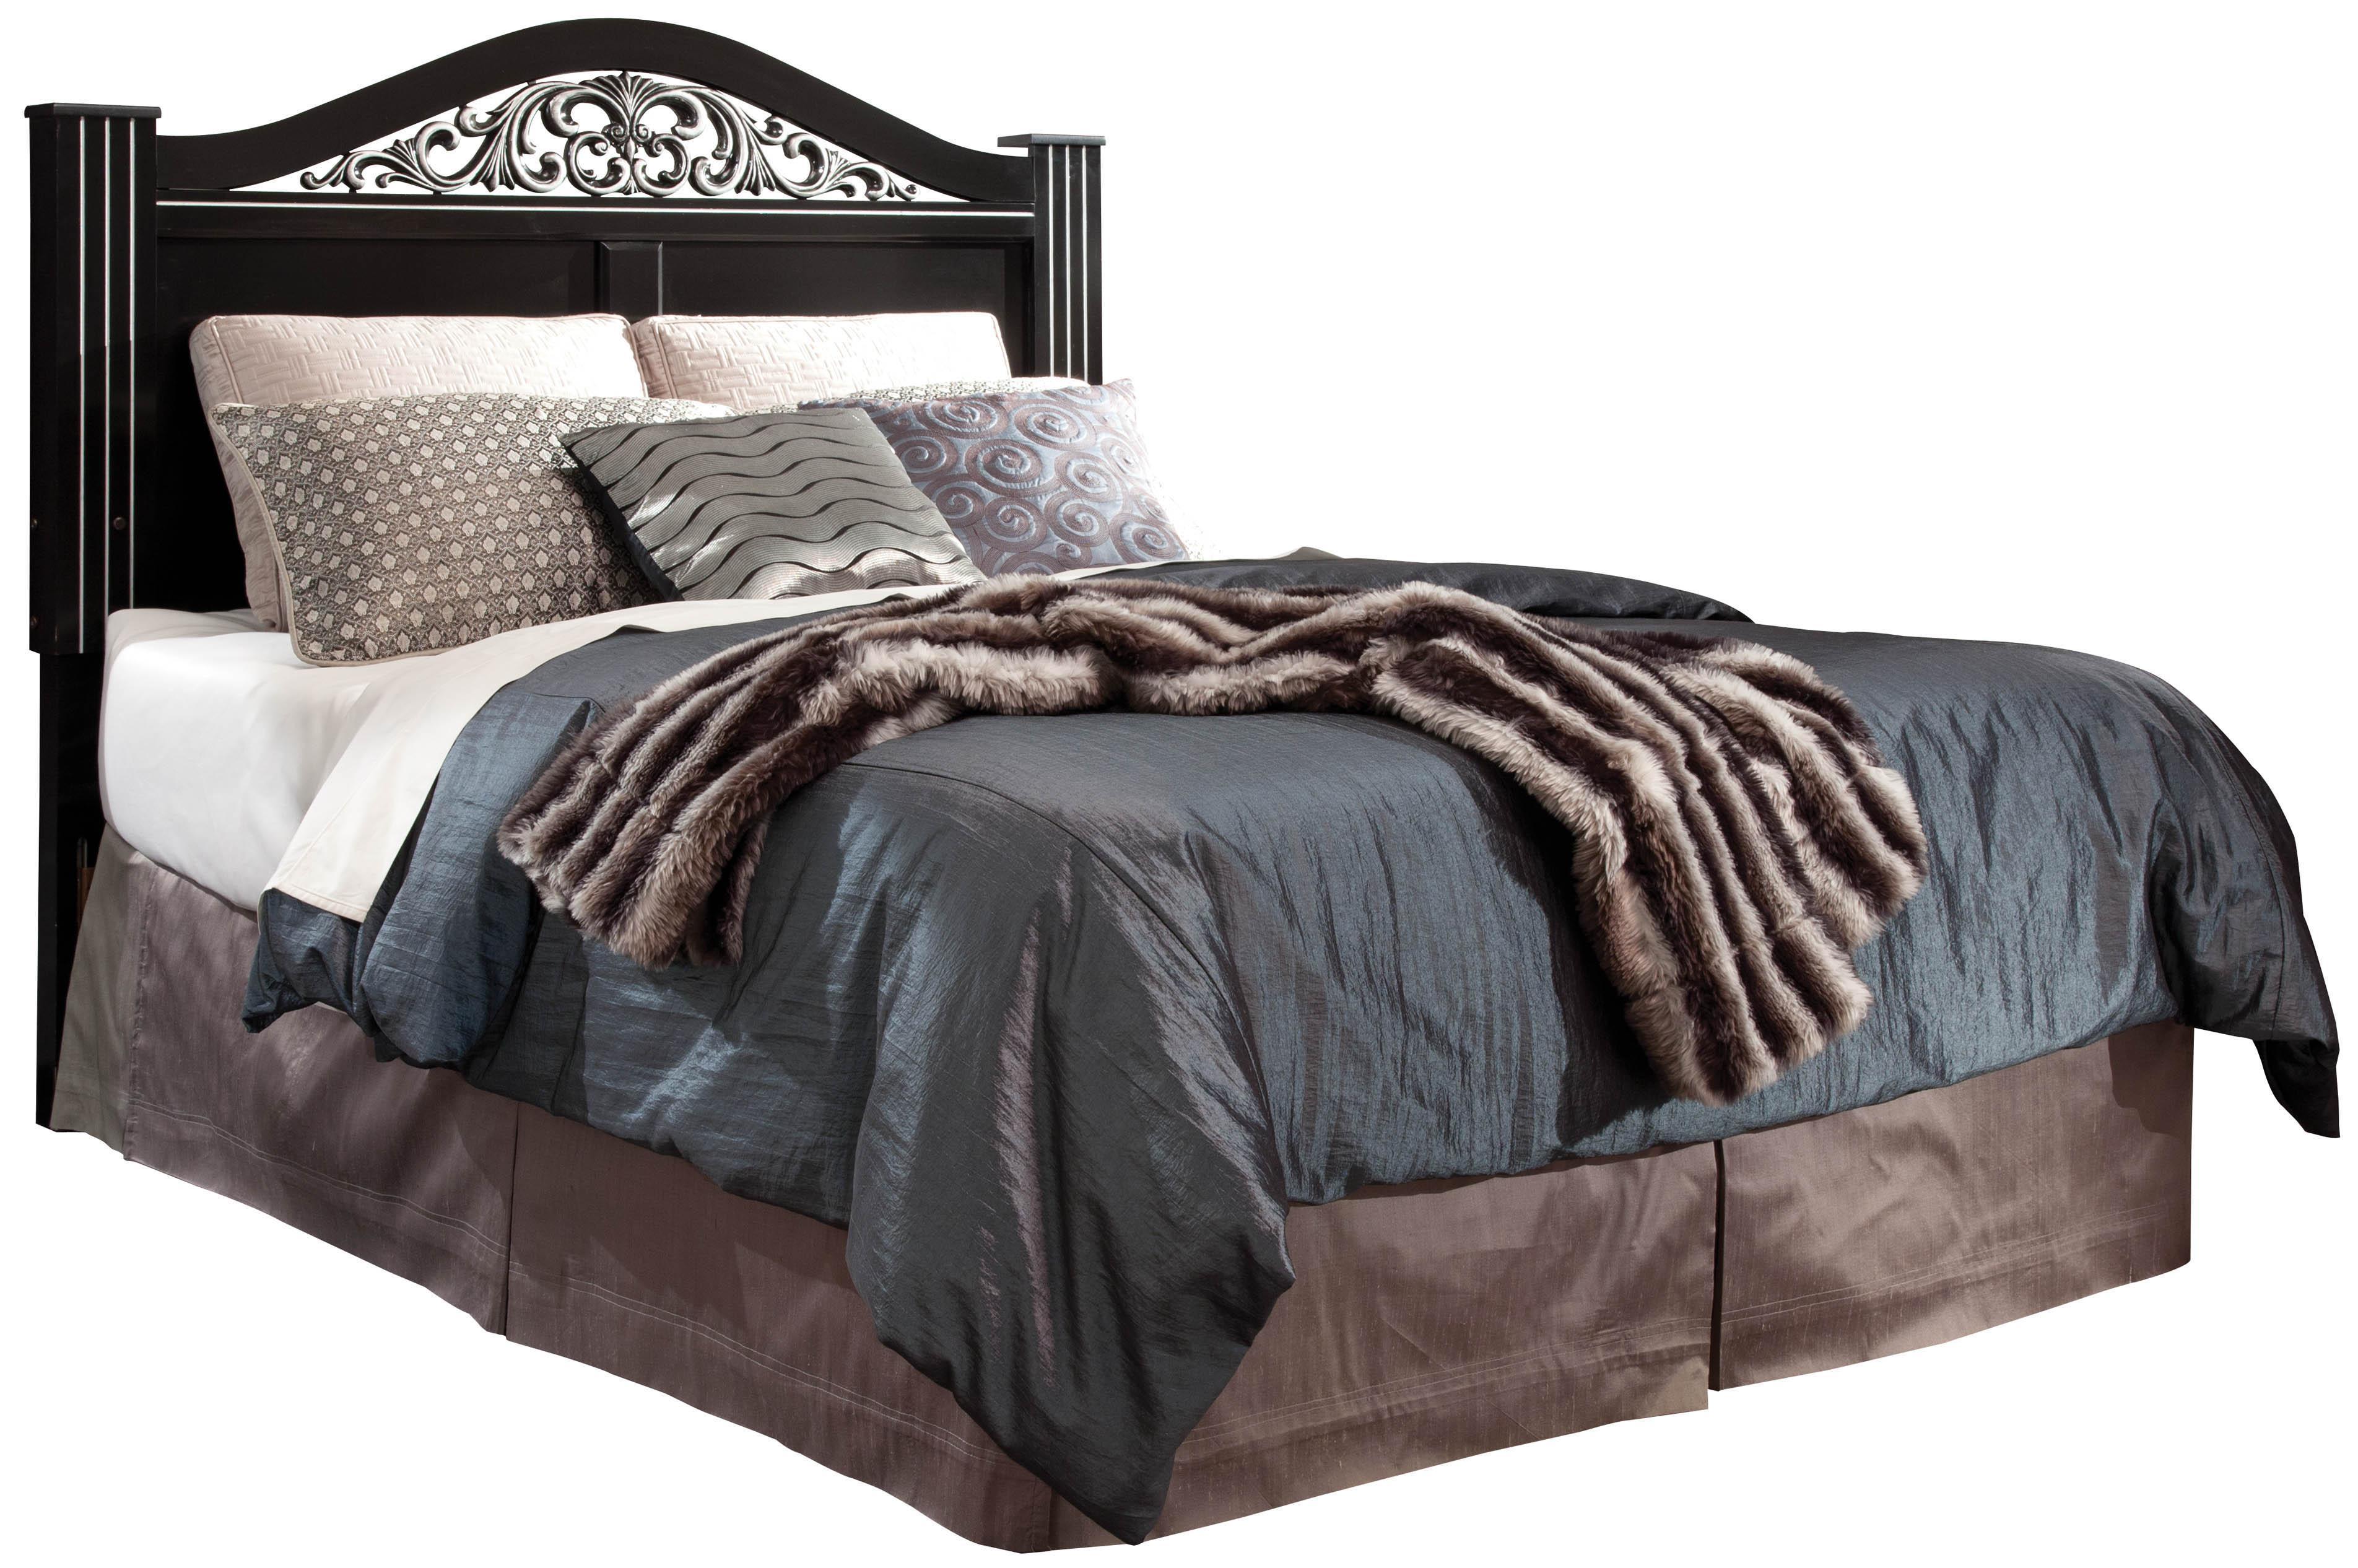 Standard Furniture Odessa King Headboard - Item Number: 69566